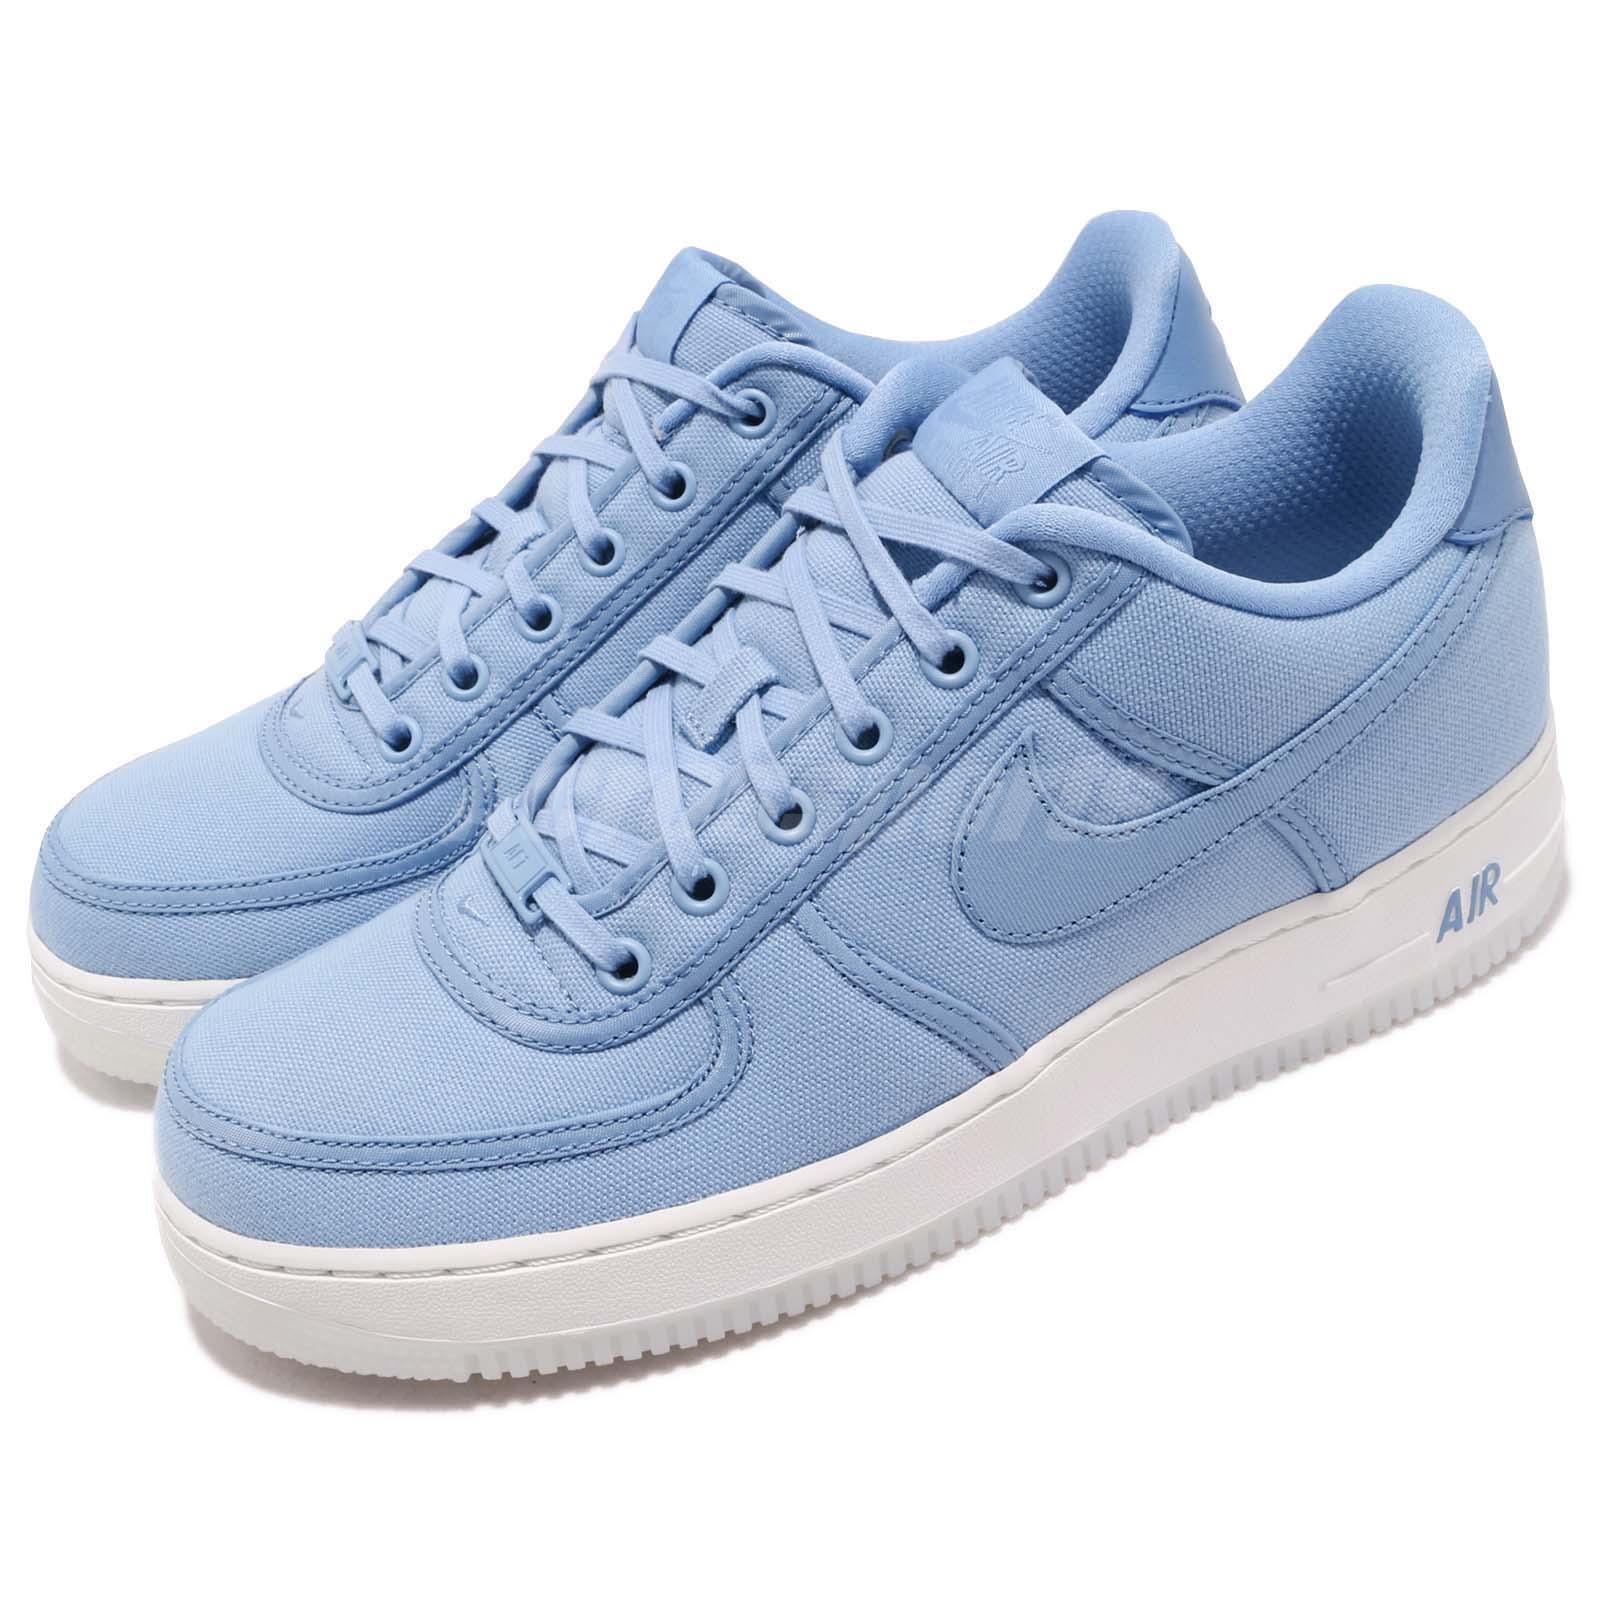 Nike Force 1 Baja diciembre Retro Qs Air CNVS diciembre Baja Cielo Azul para Hombre Zapatos  AF1 AH1067401 e43674